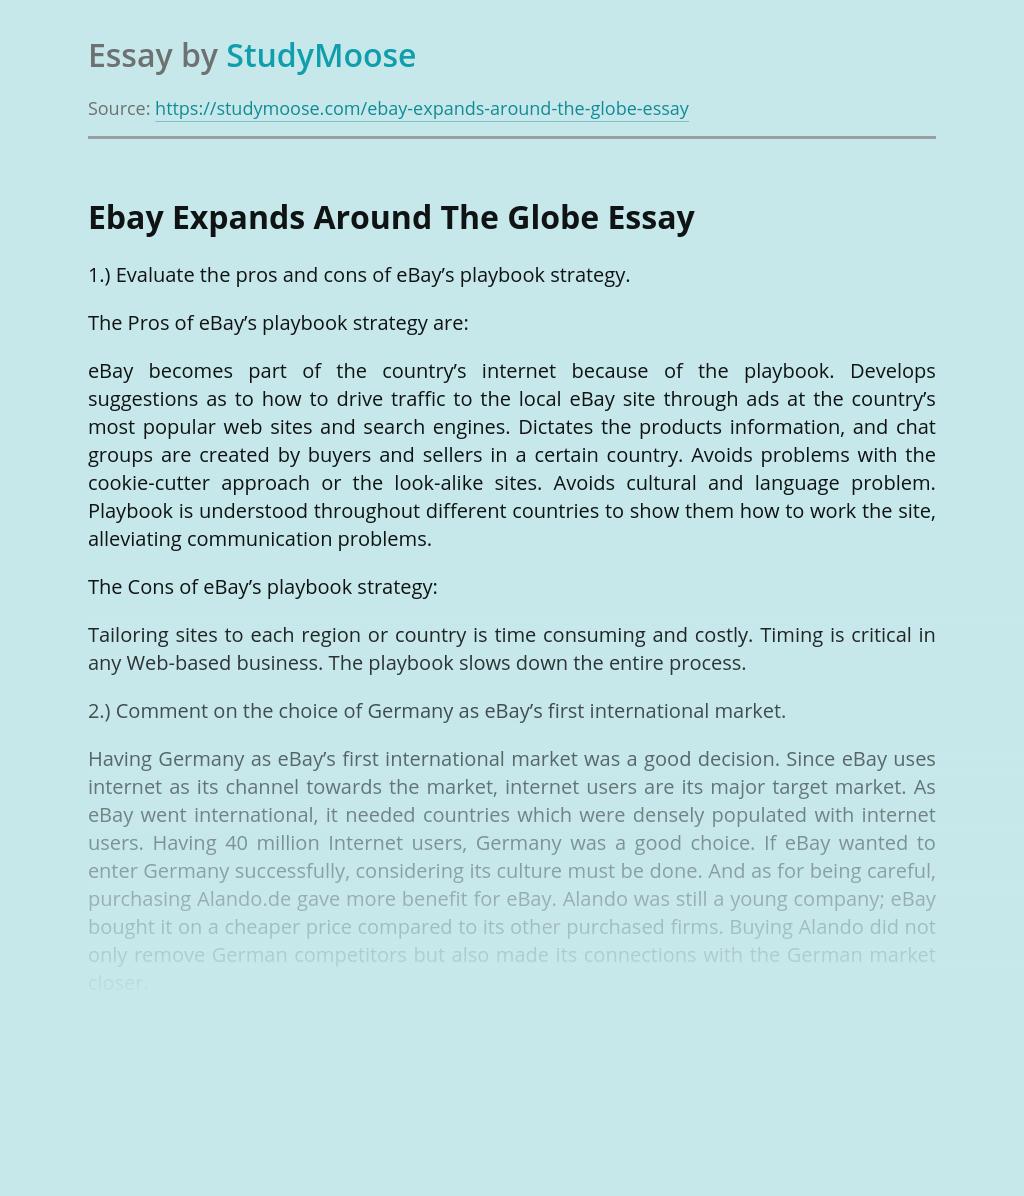 Ebay Expands Around The Globe